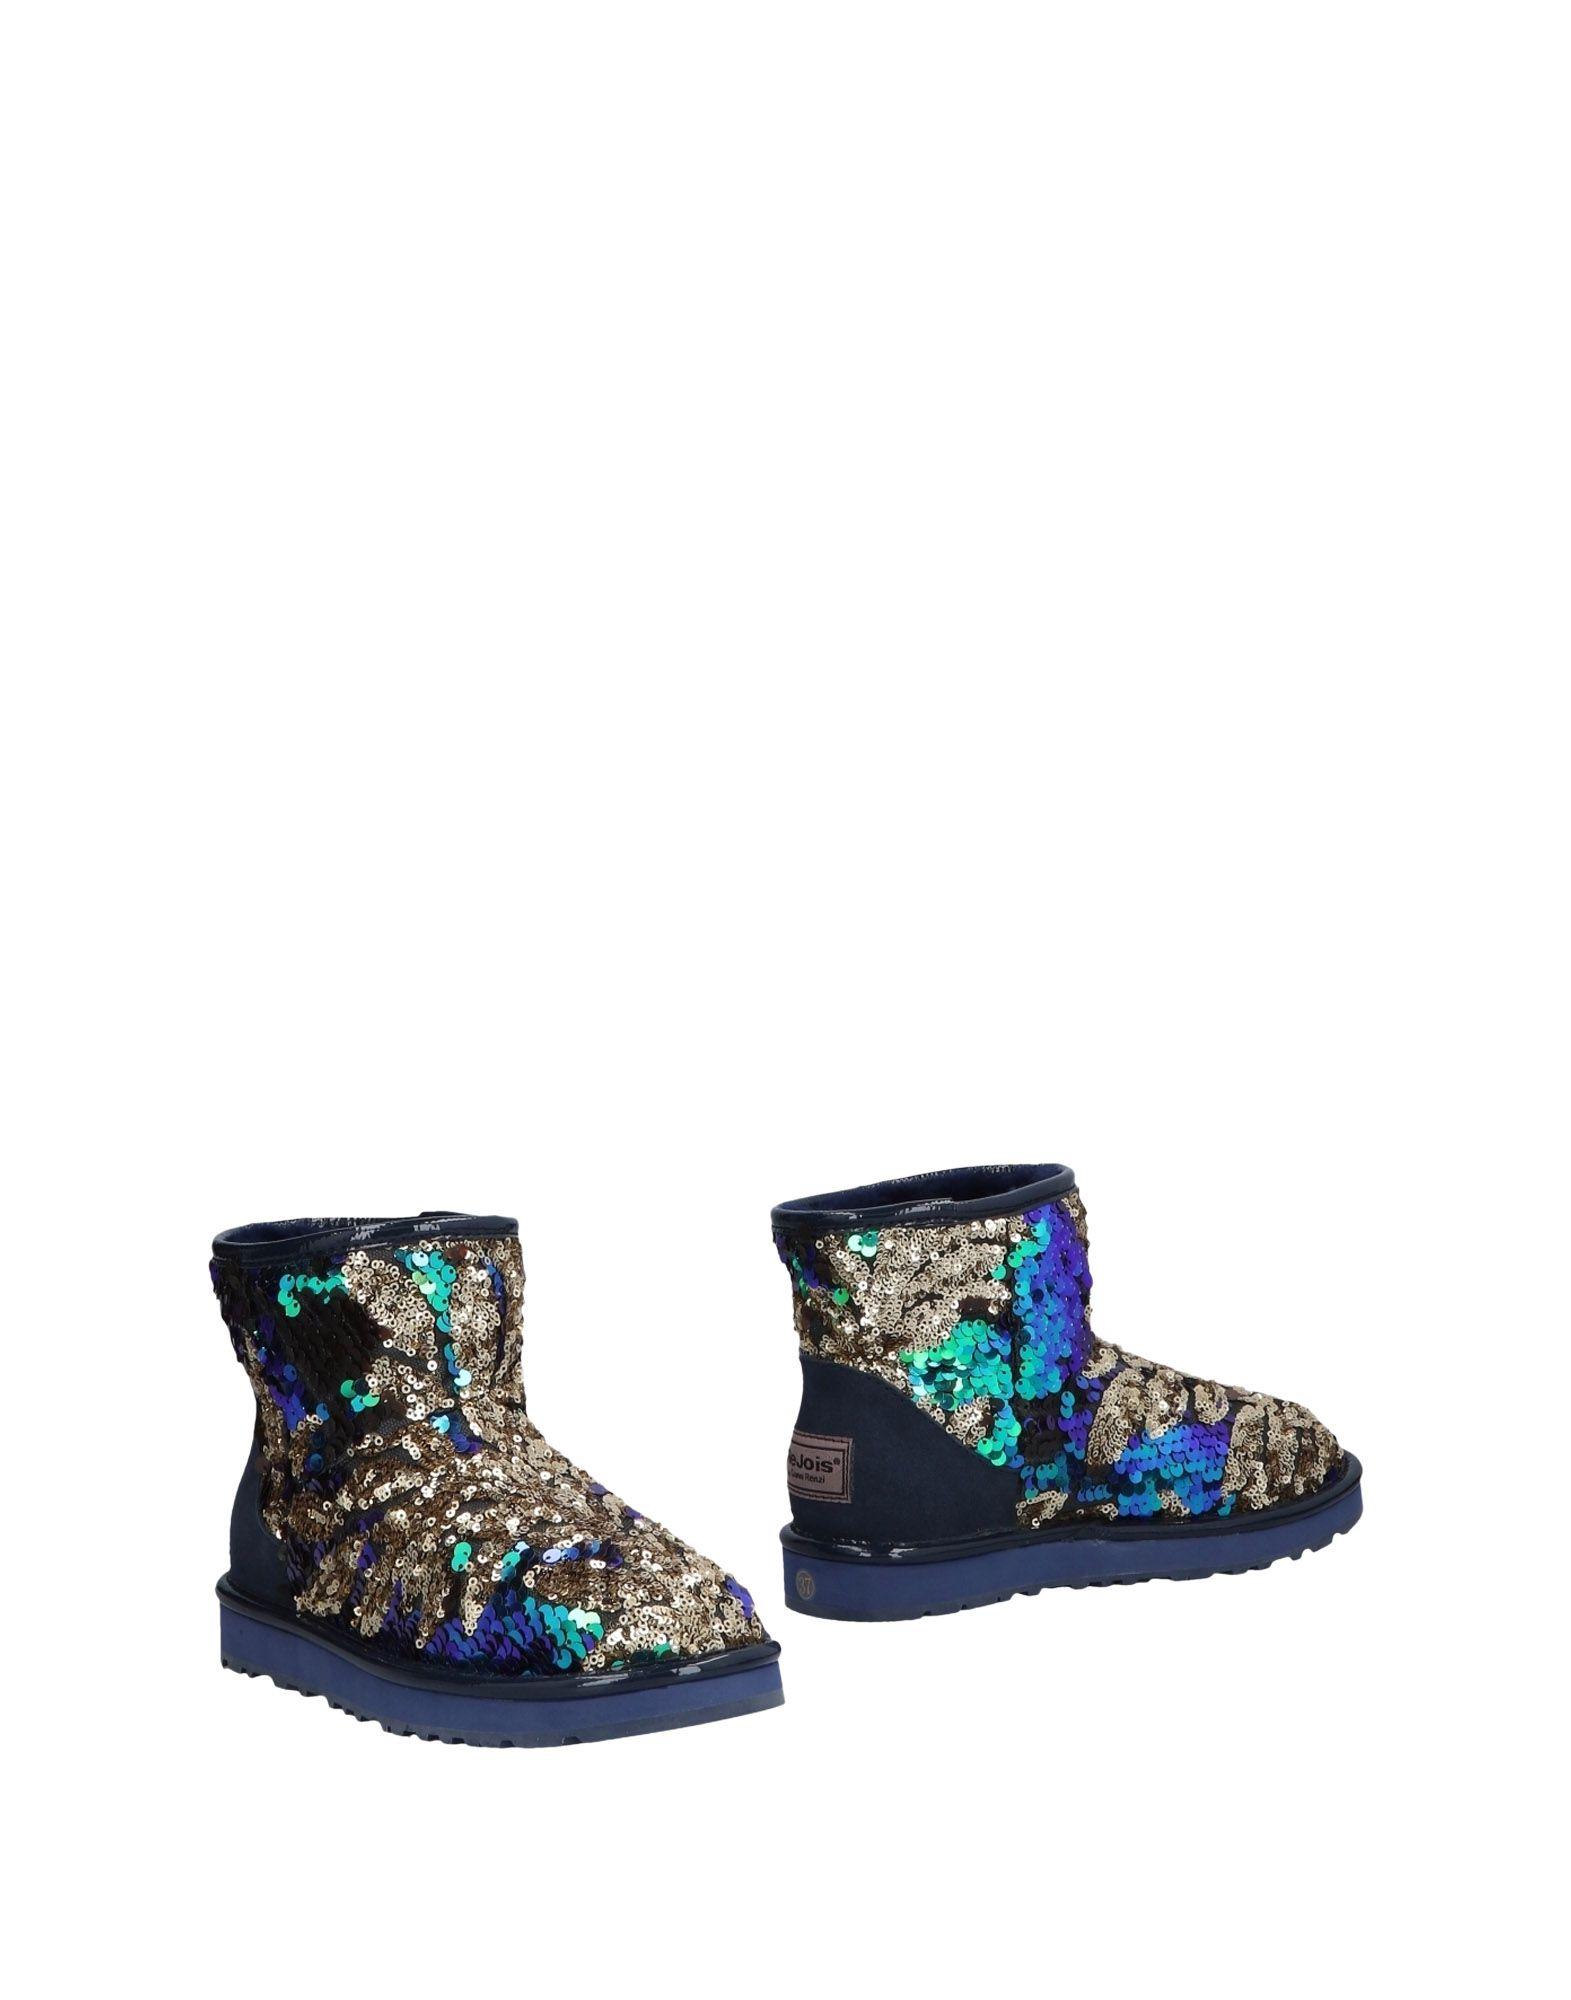 REJOIS by GIANNI RENZI Полусапоги и высокие ботинки